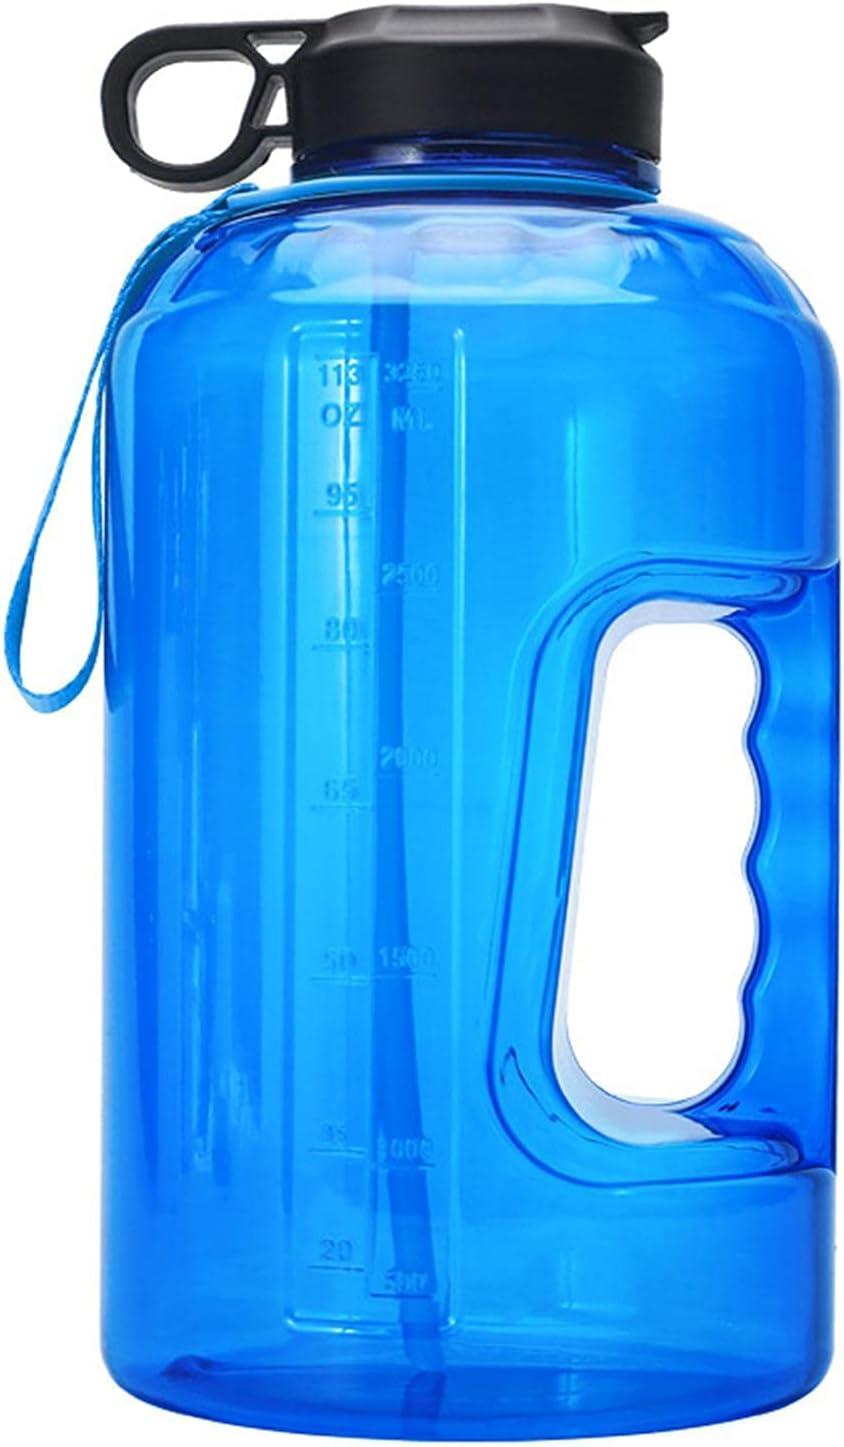 WuLL Dedication 1 Gallon Large Motivational Spo Bottle Sports Water Recommendation Plastic